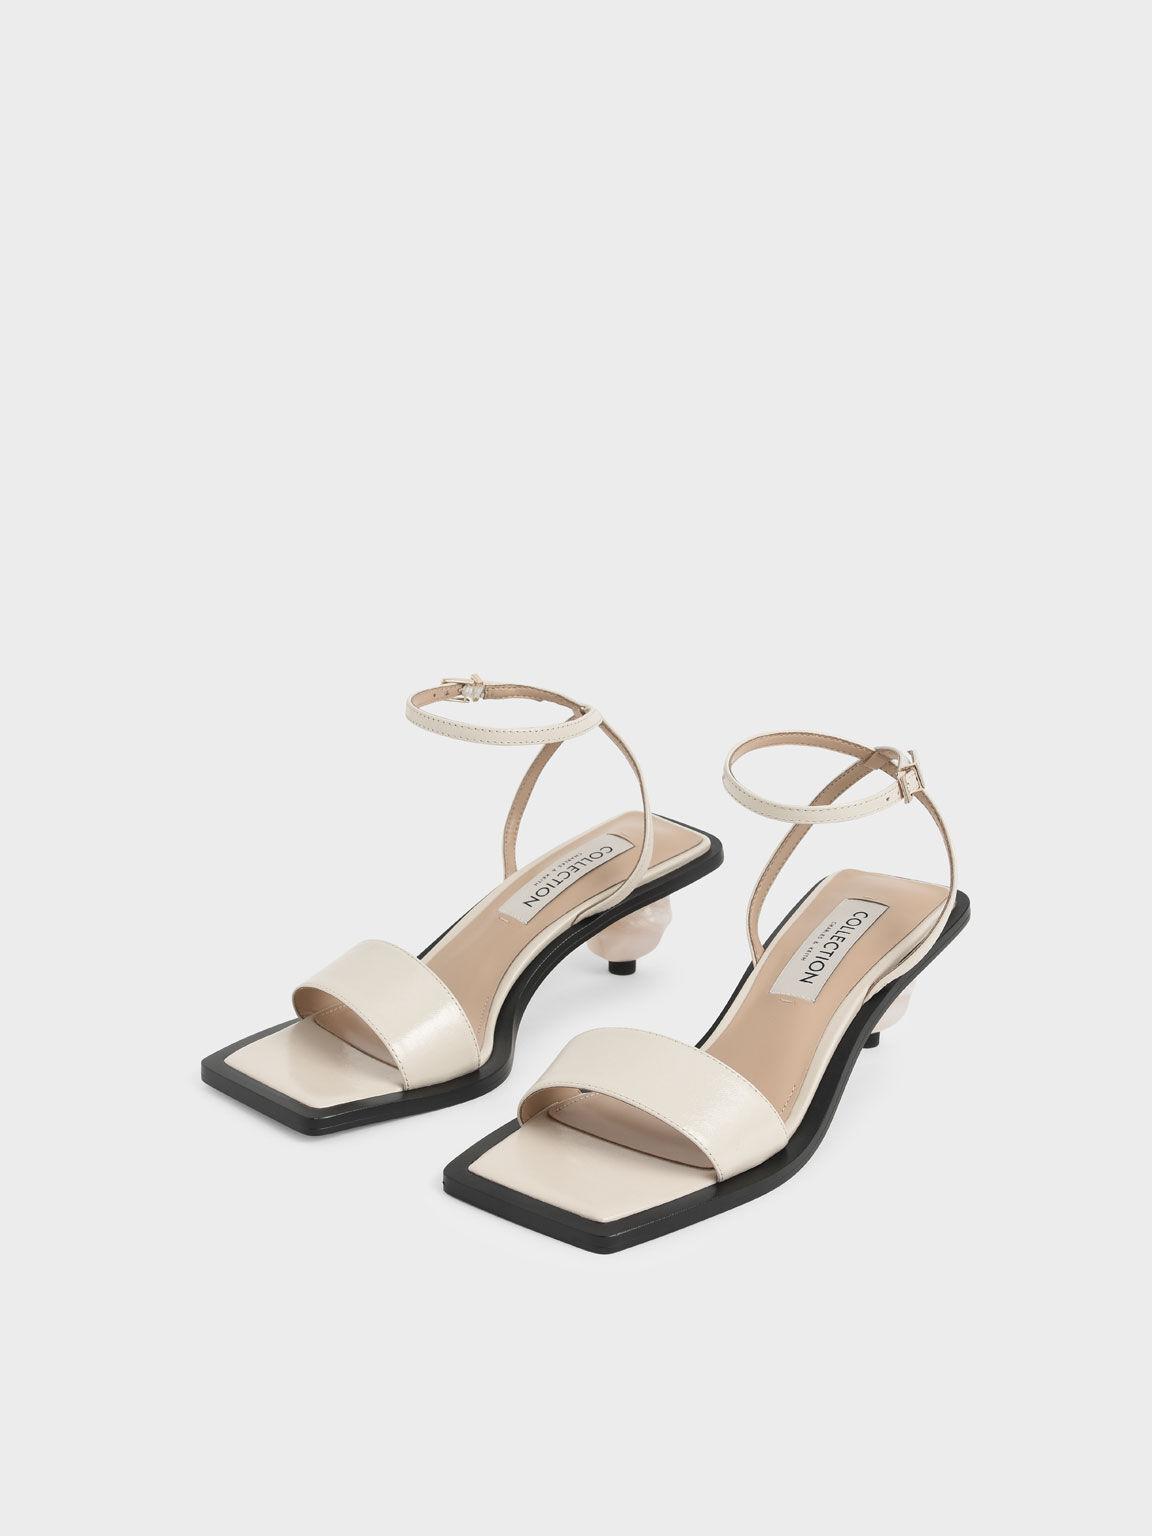 Sculptural Heel Sandals (Kid Leather), Beige, hi-res